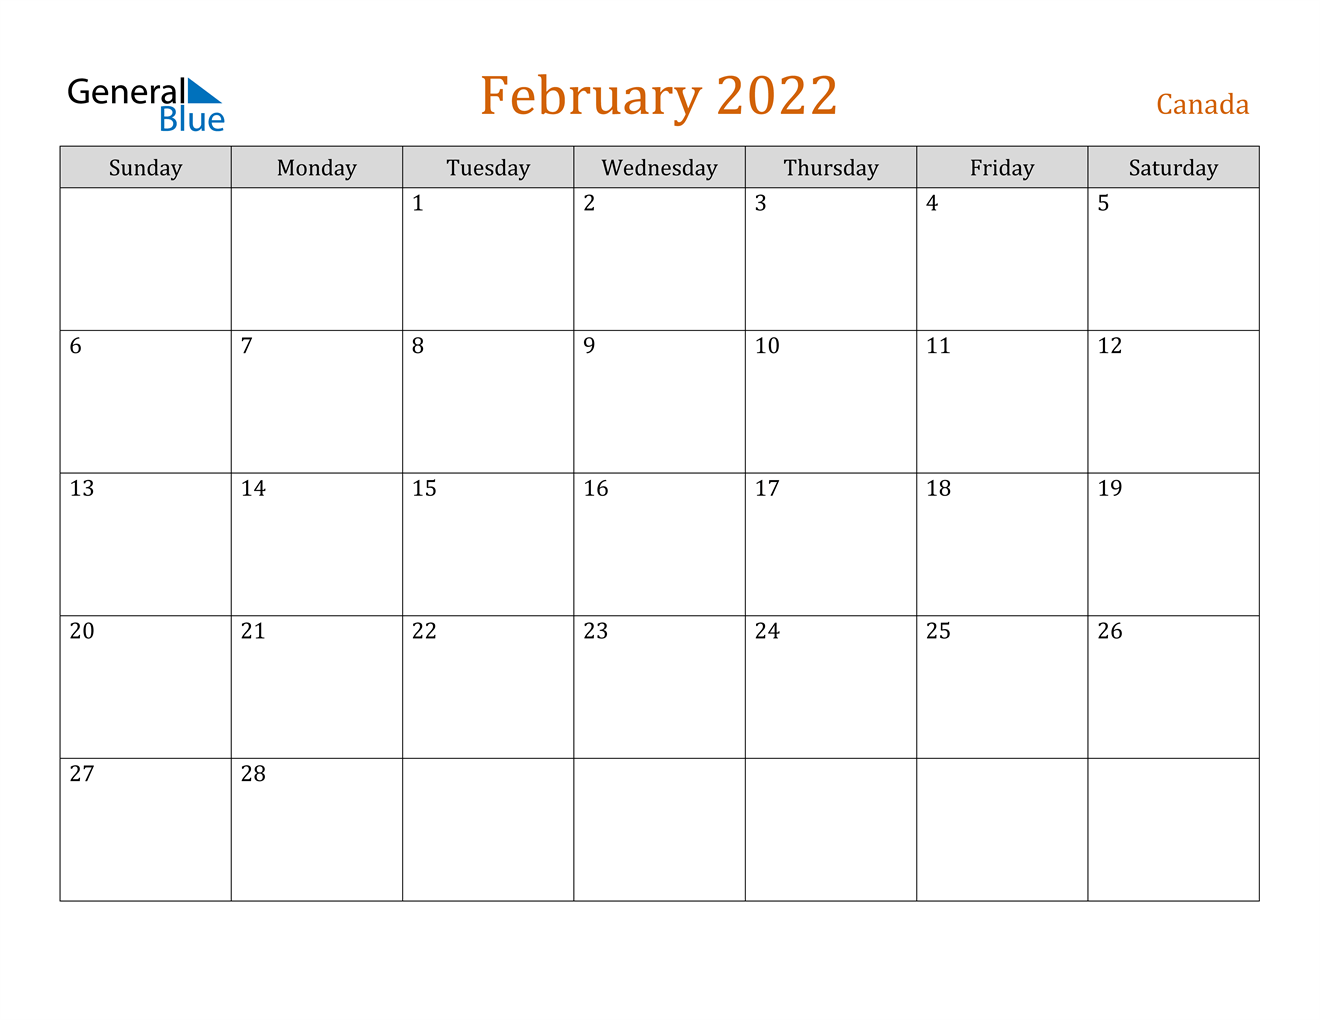 February 2022 Calendar - Canada